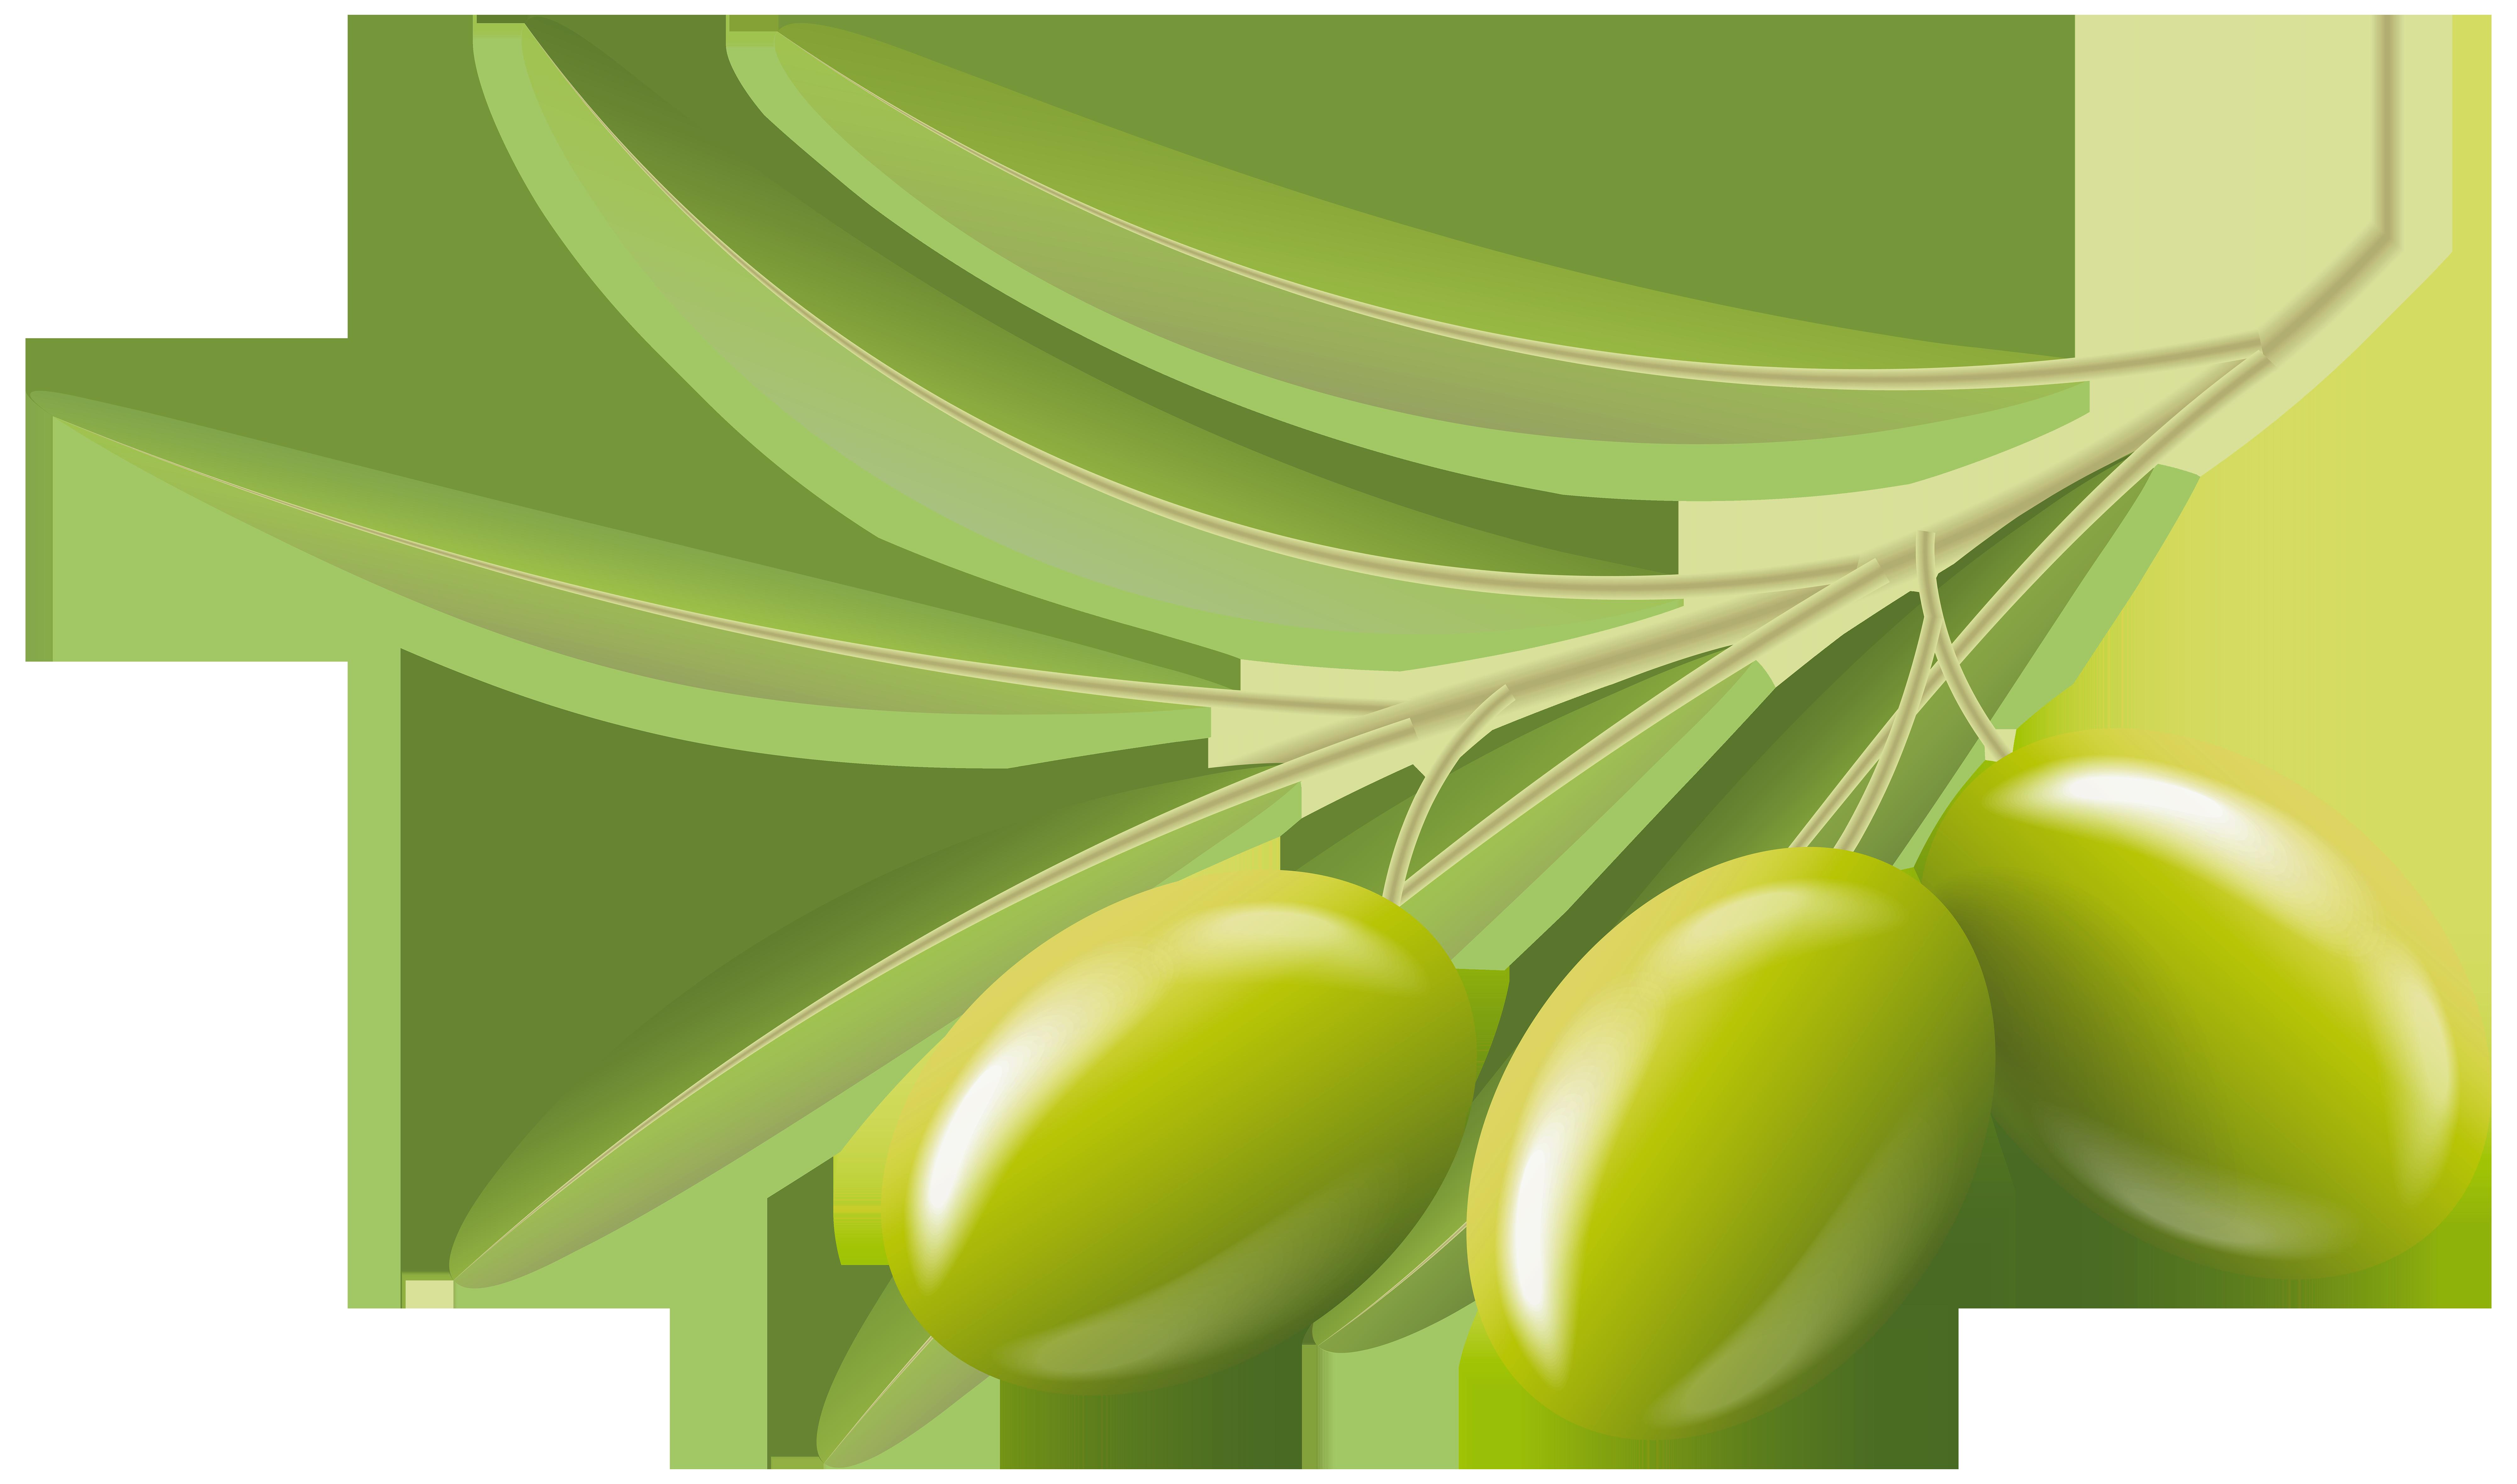 Clipart olives png transparent stock Green Olives Transparent Clip Art Image | Gallery Yopriceville ... png transparent stock